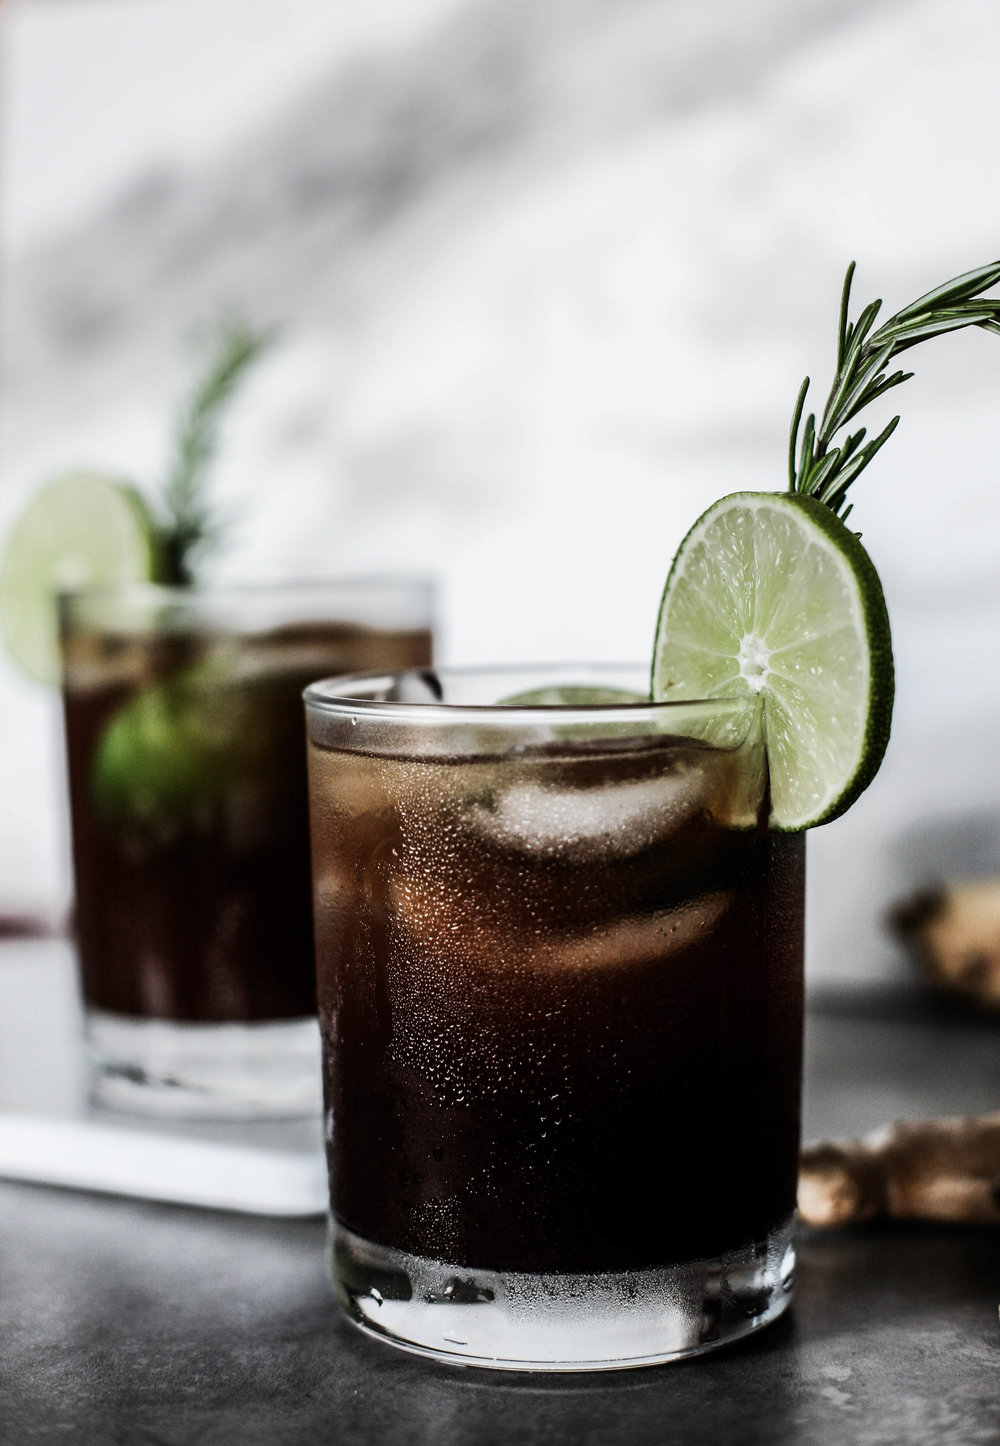 Winter Spiced Ginger Beer Cocktail